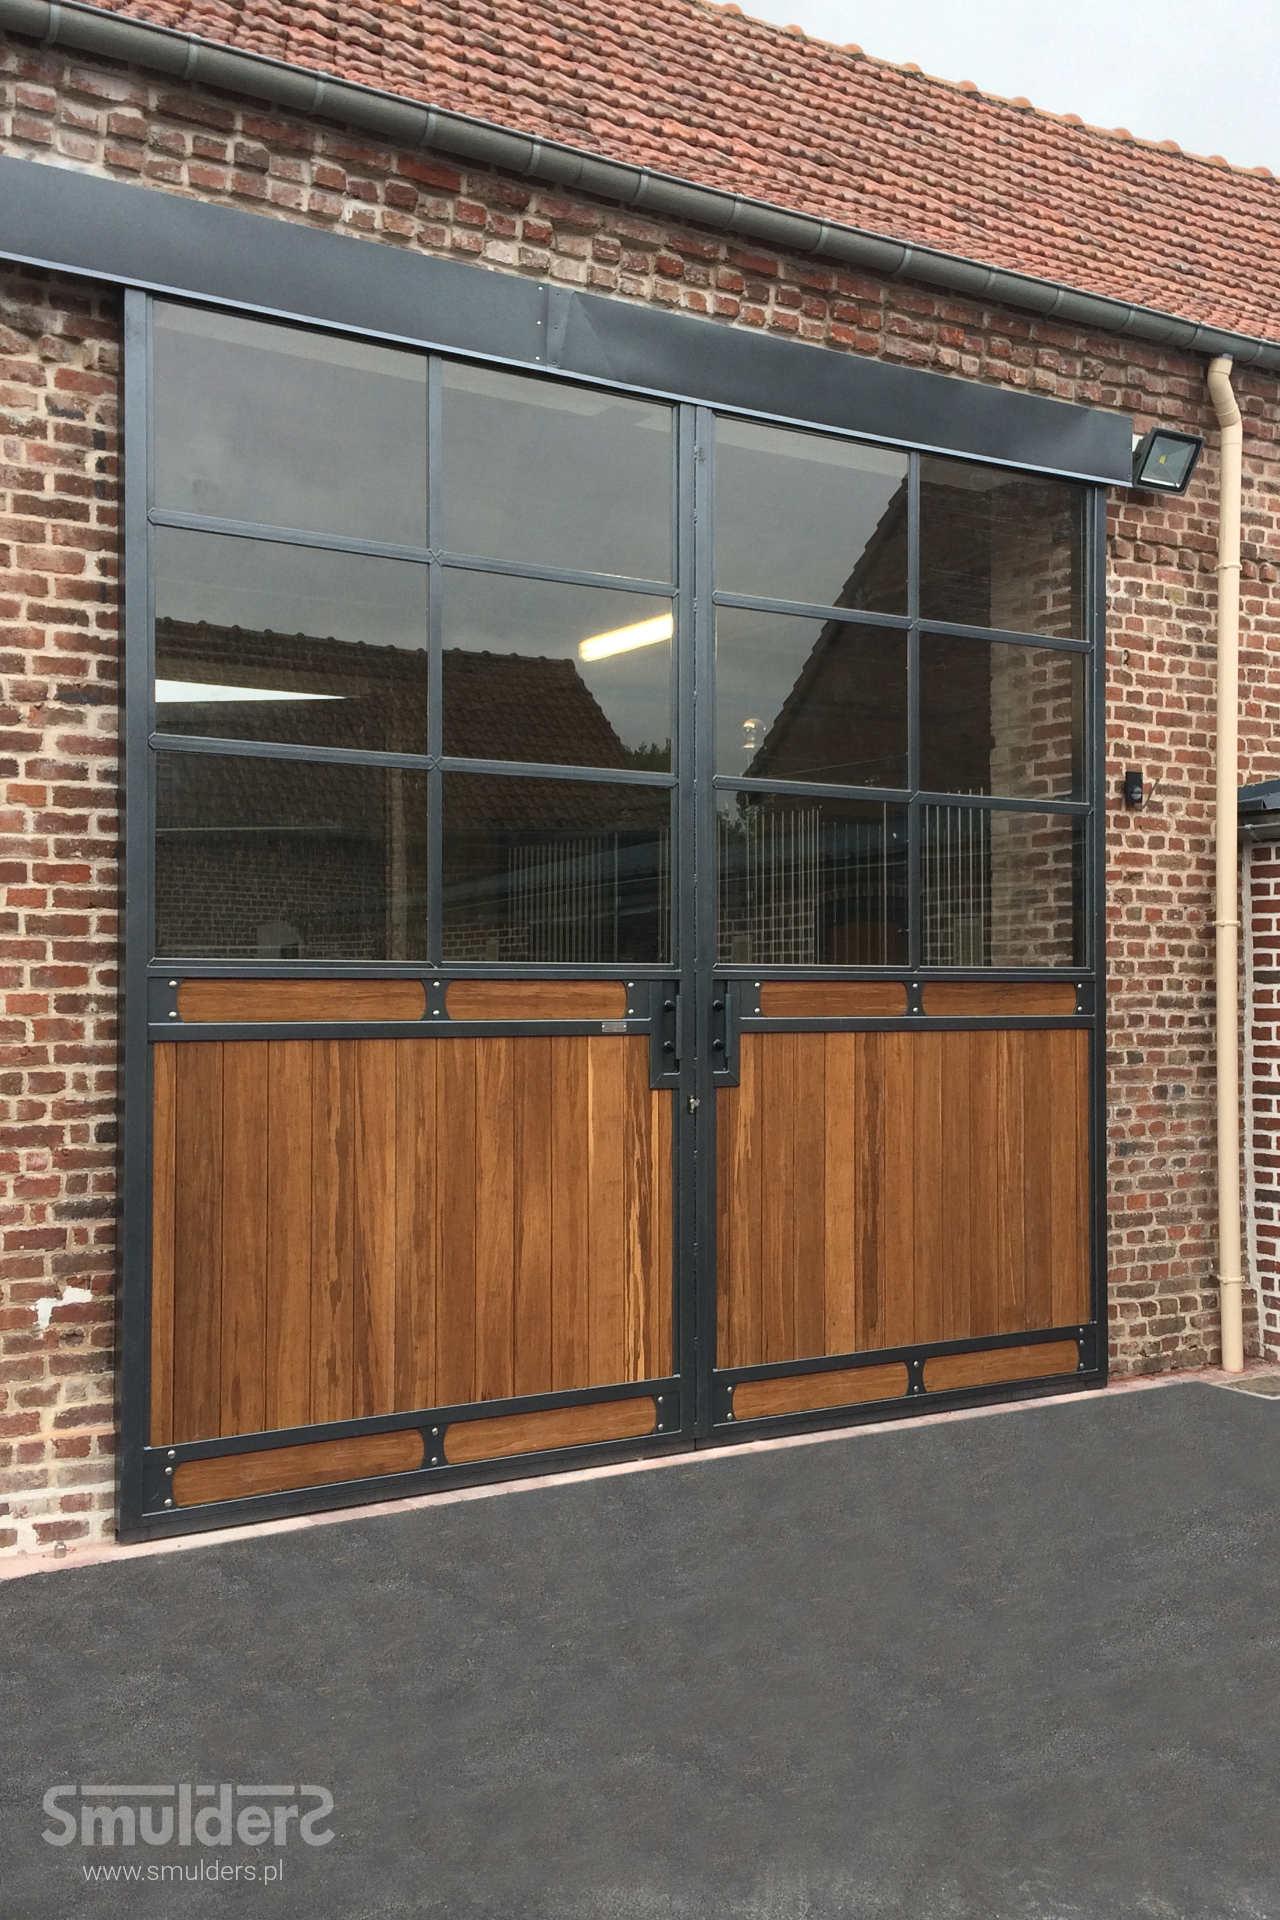 https://www.smulders.pl/wp-content/uploads/2019/03/f004_internal-stables_professional-series_doors_windows_barn-doors_NN_SMULDERS_PL.jpg